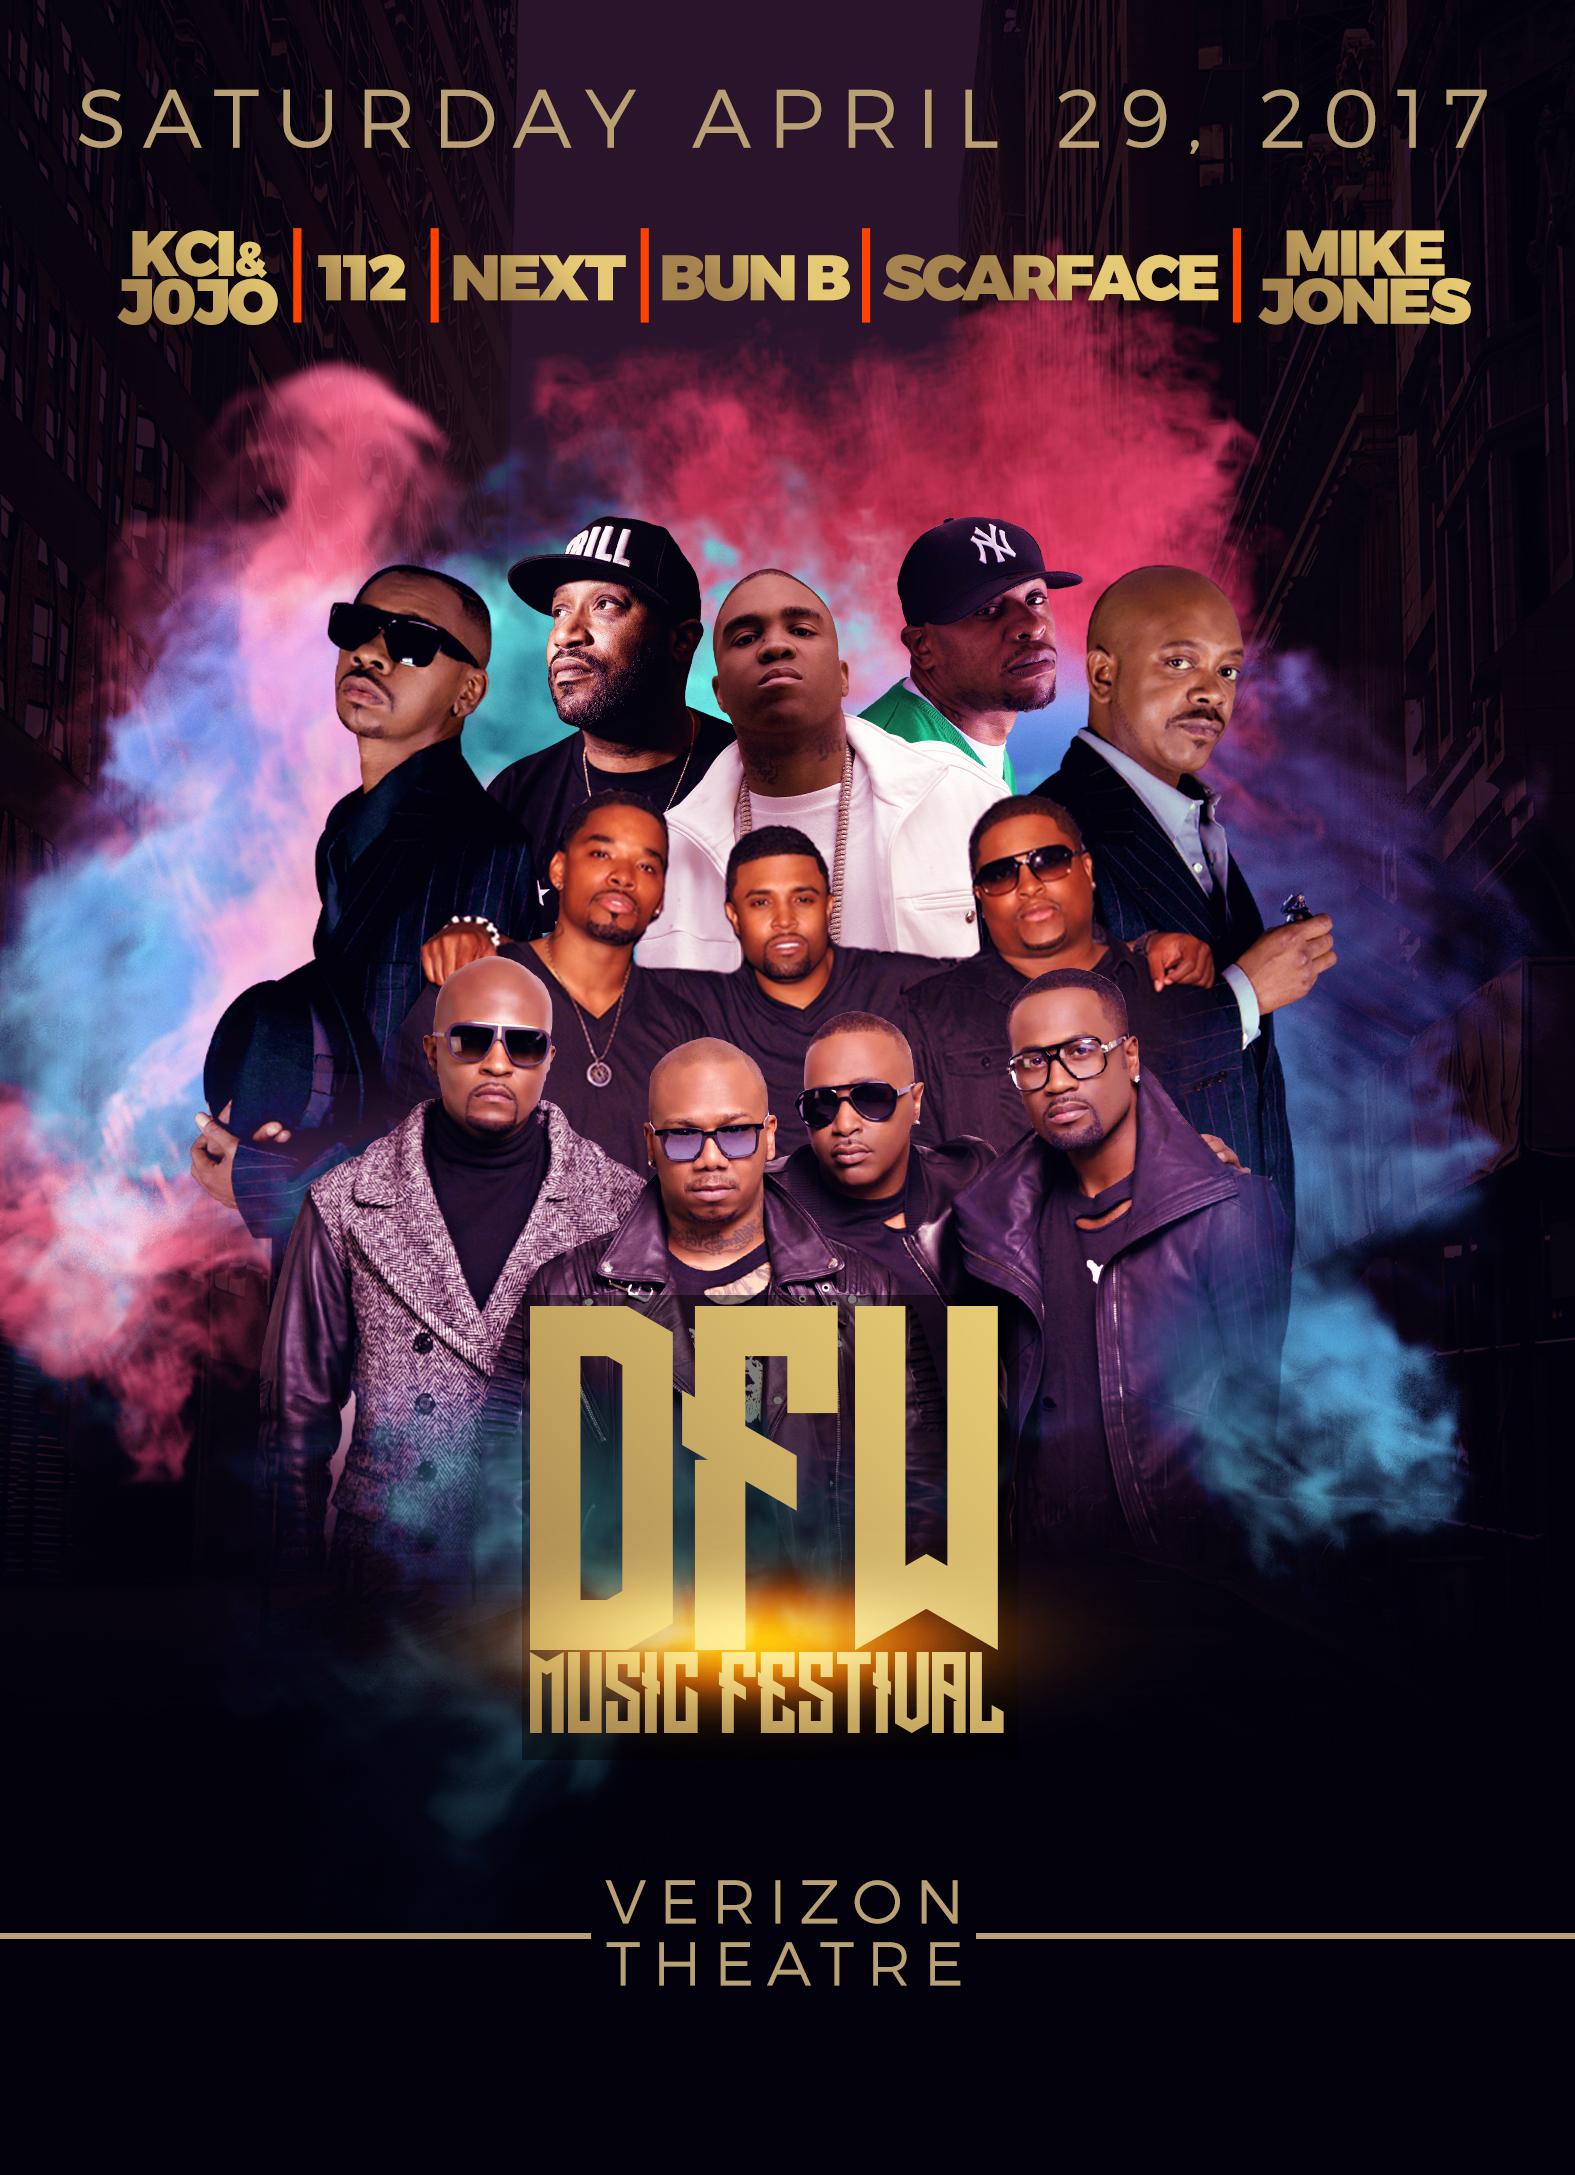 DFW MUSIC FESTIVAL